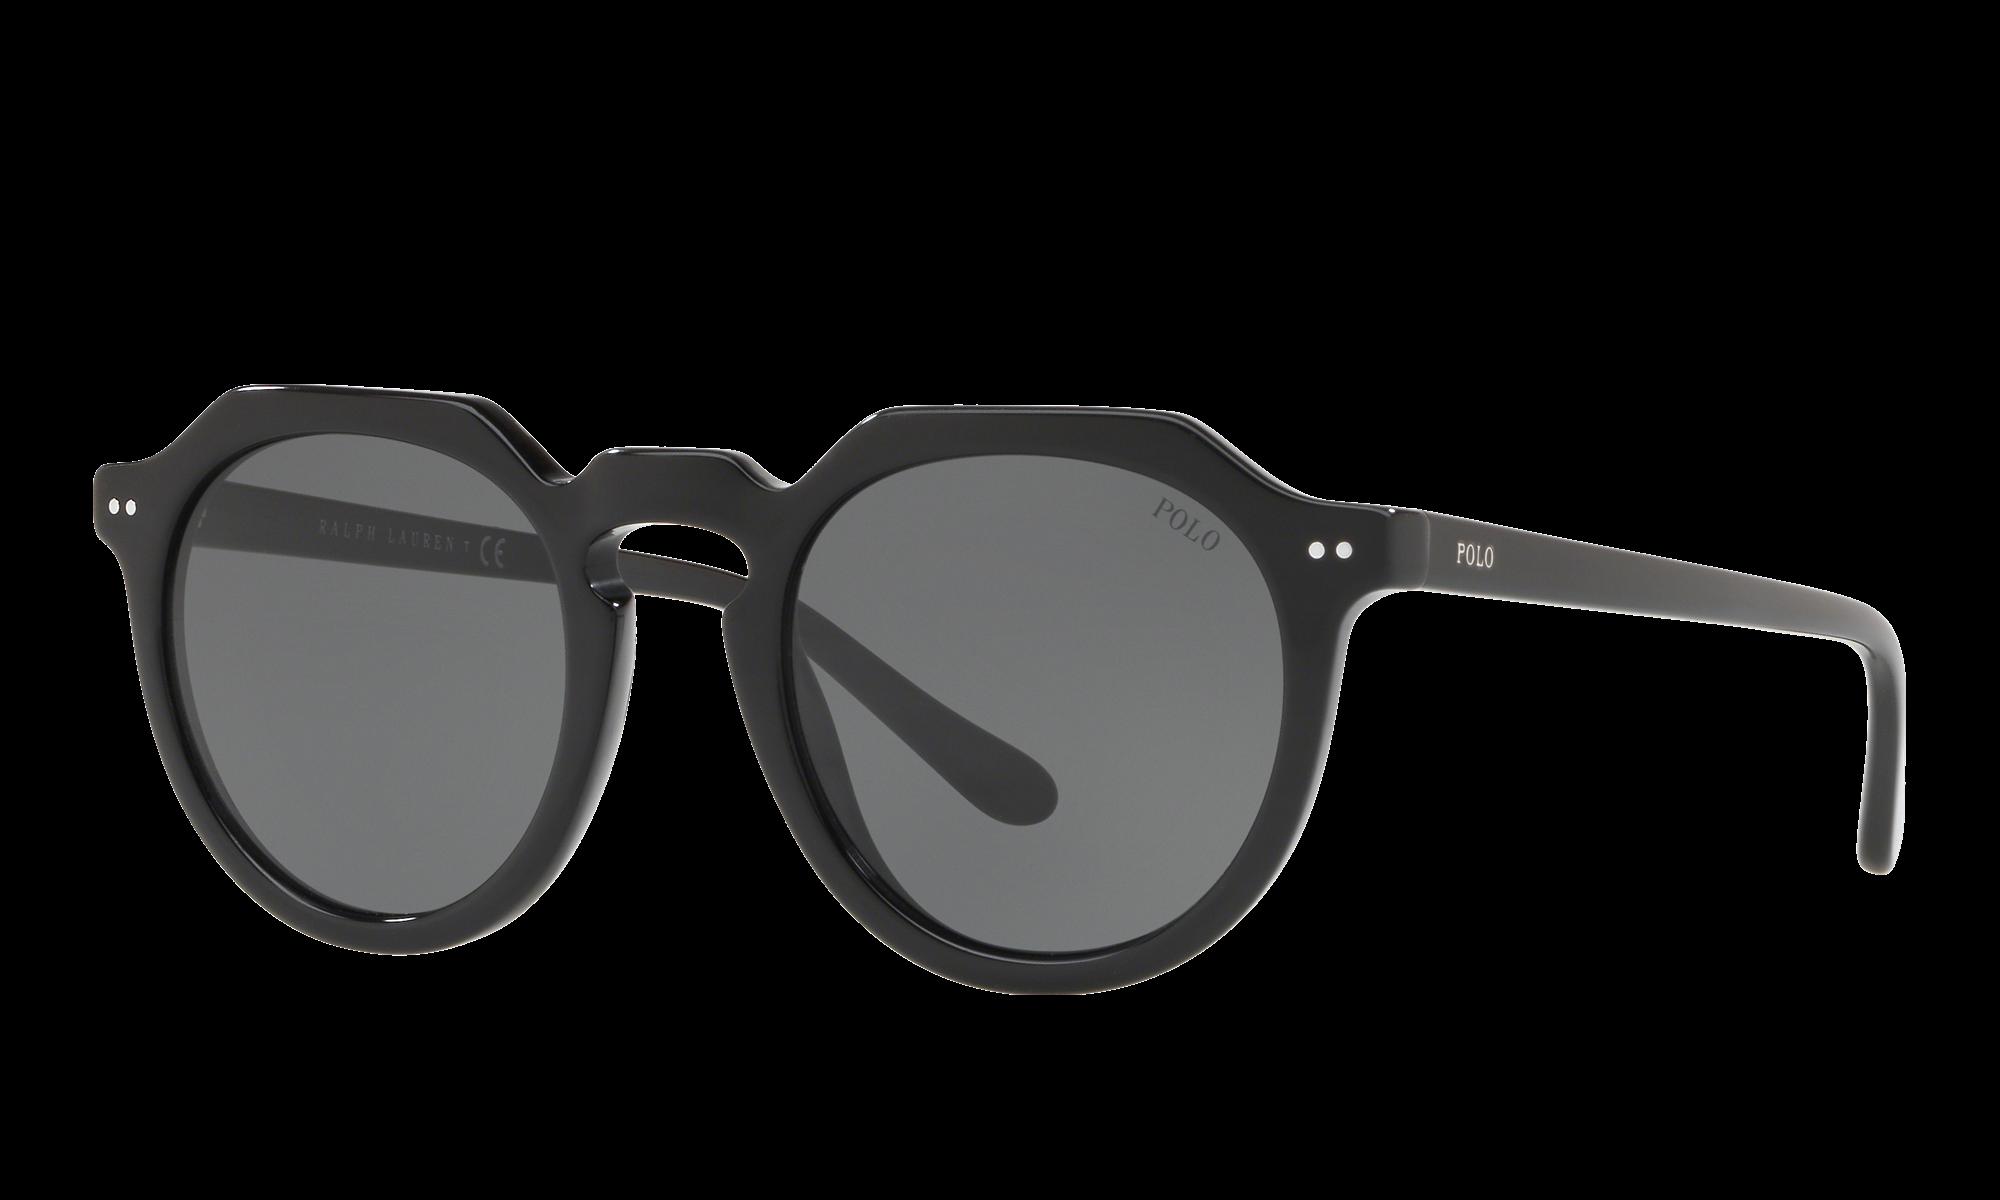 Retro Sunglasses | Vintage Glasses | New Vintage Eyeglasses Polo Ralph Lauren Unisex Ph4138 Black Size Standard $79.00 AT vintagedancer.com